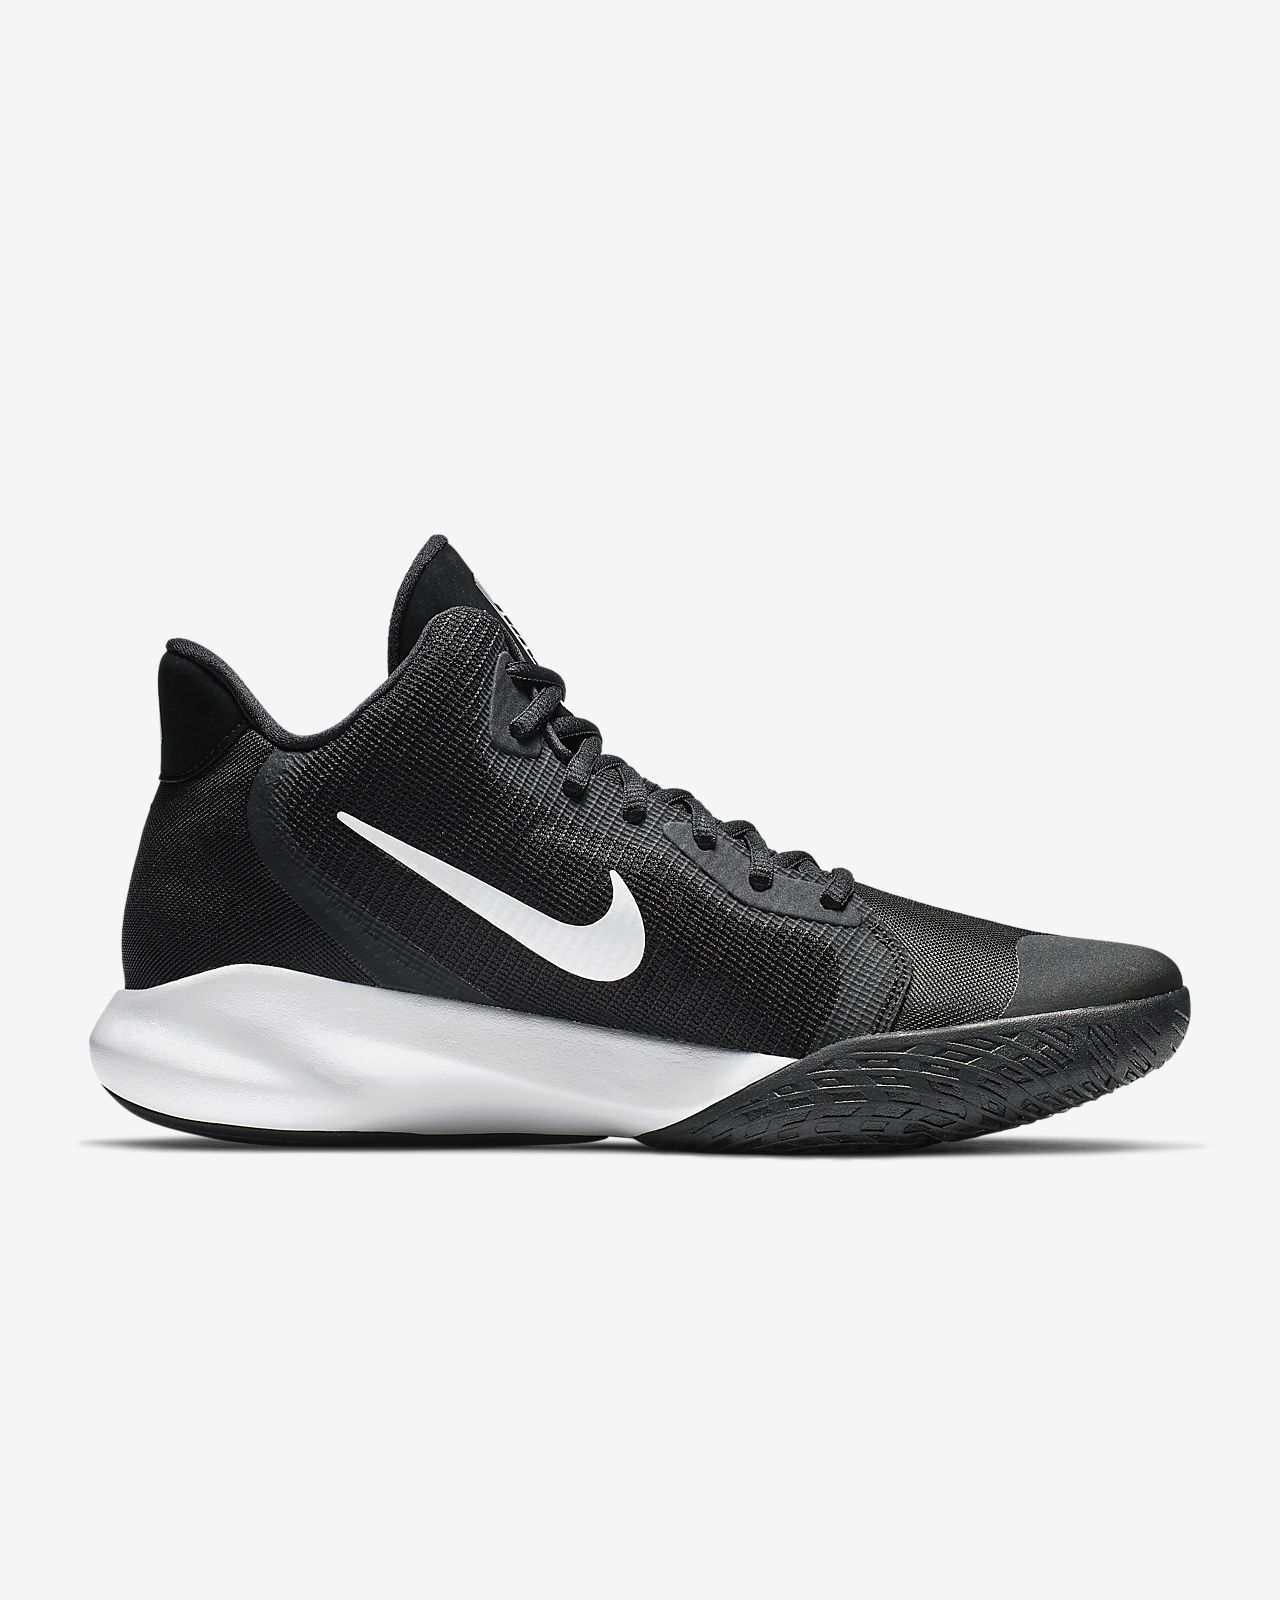 Nike Performance, Precision Iii Basketballschuhe, schwarzweiß